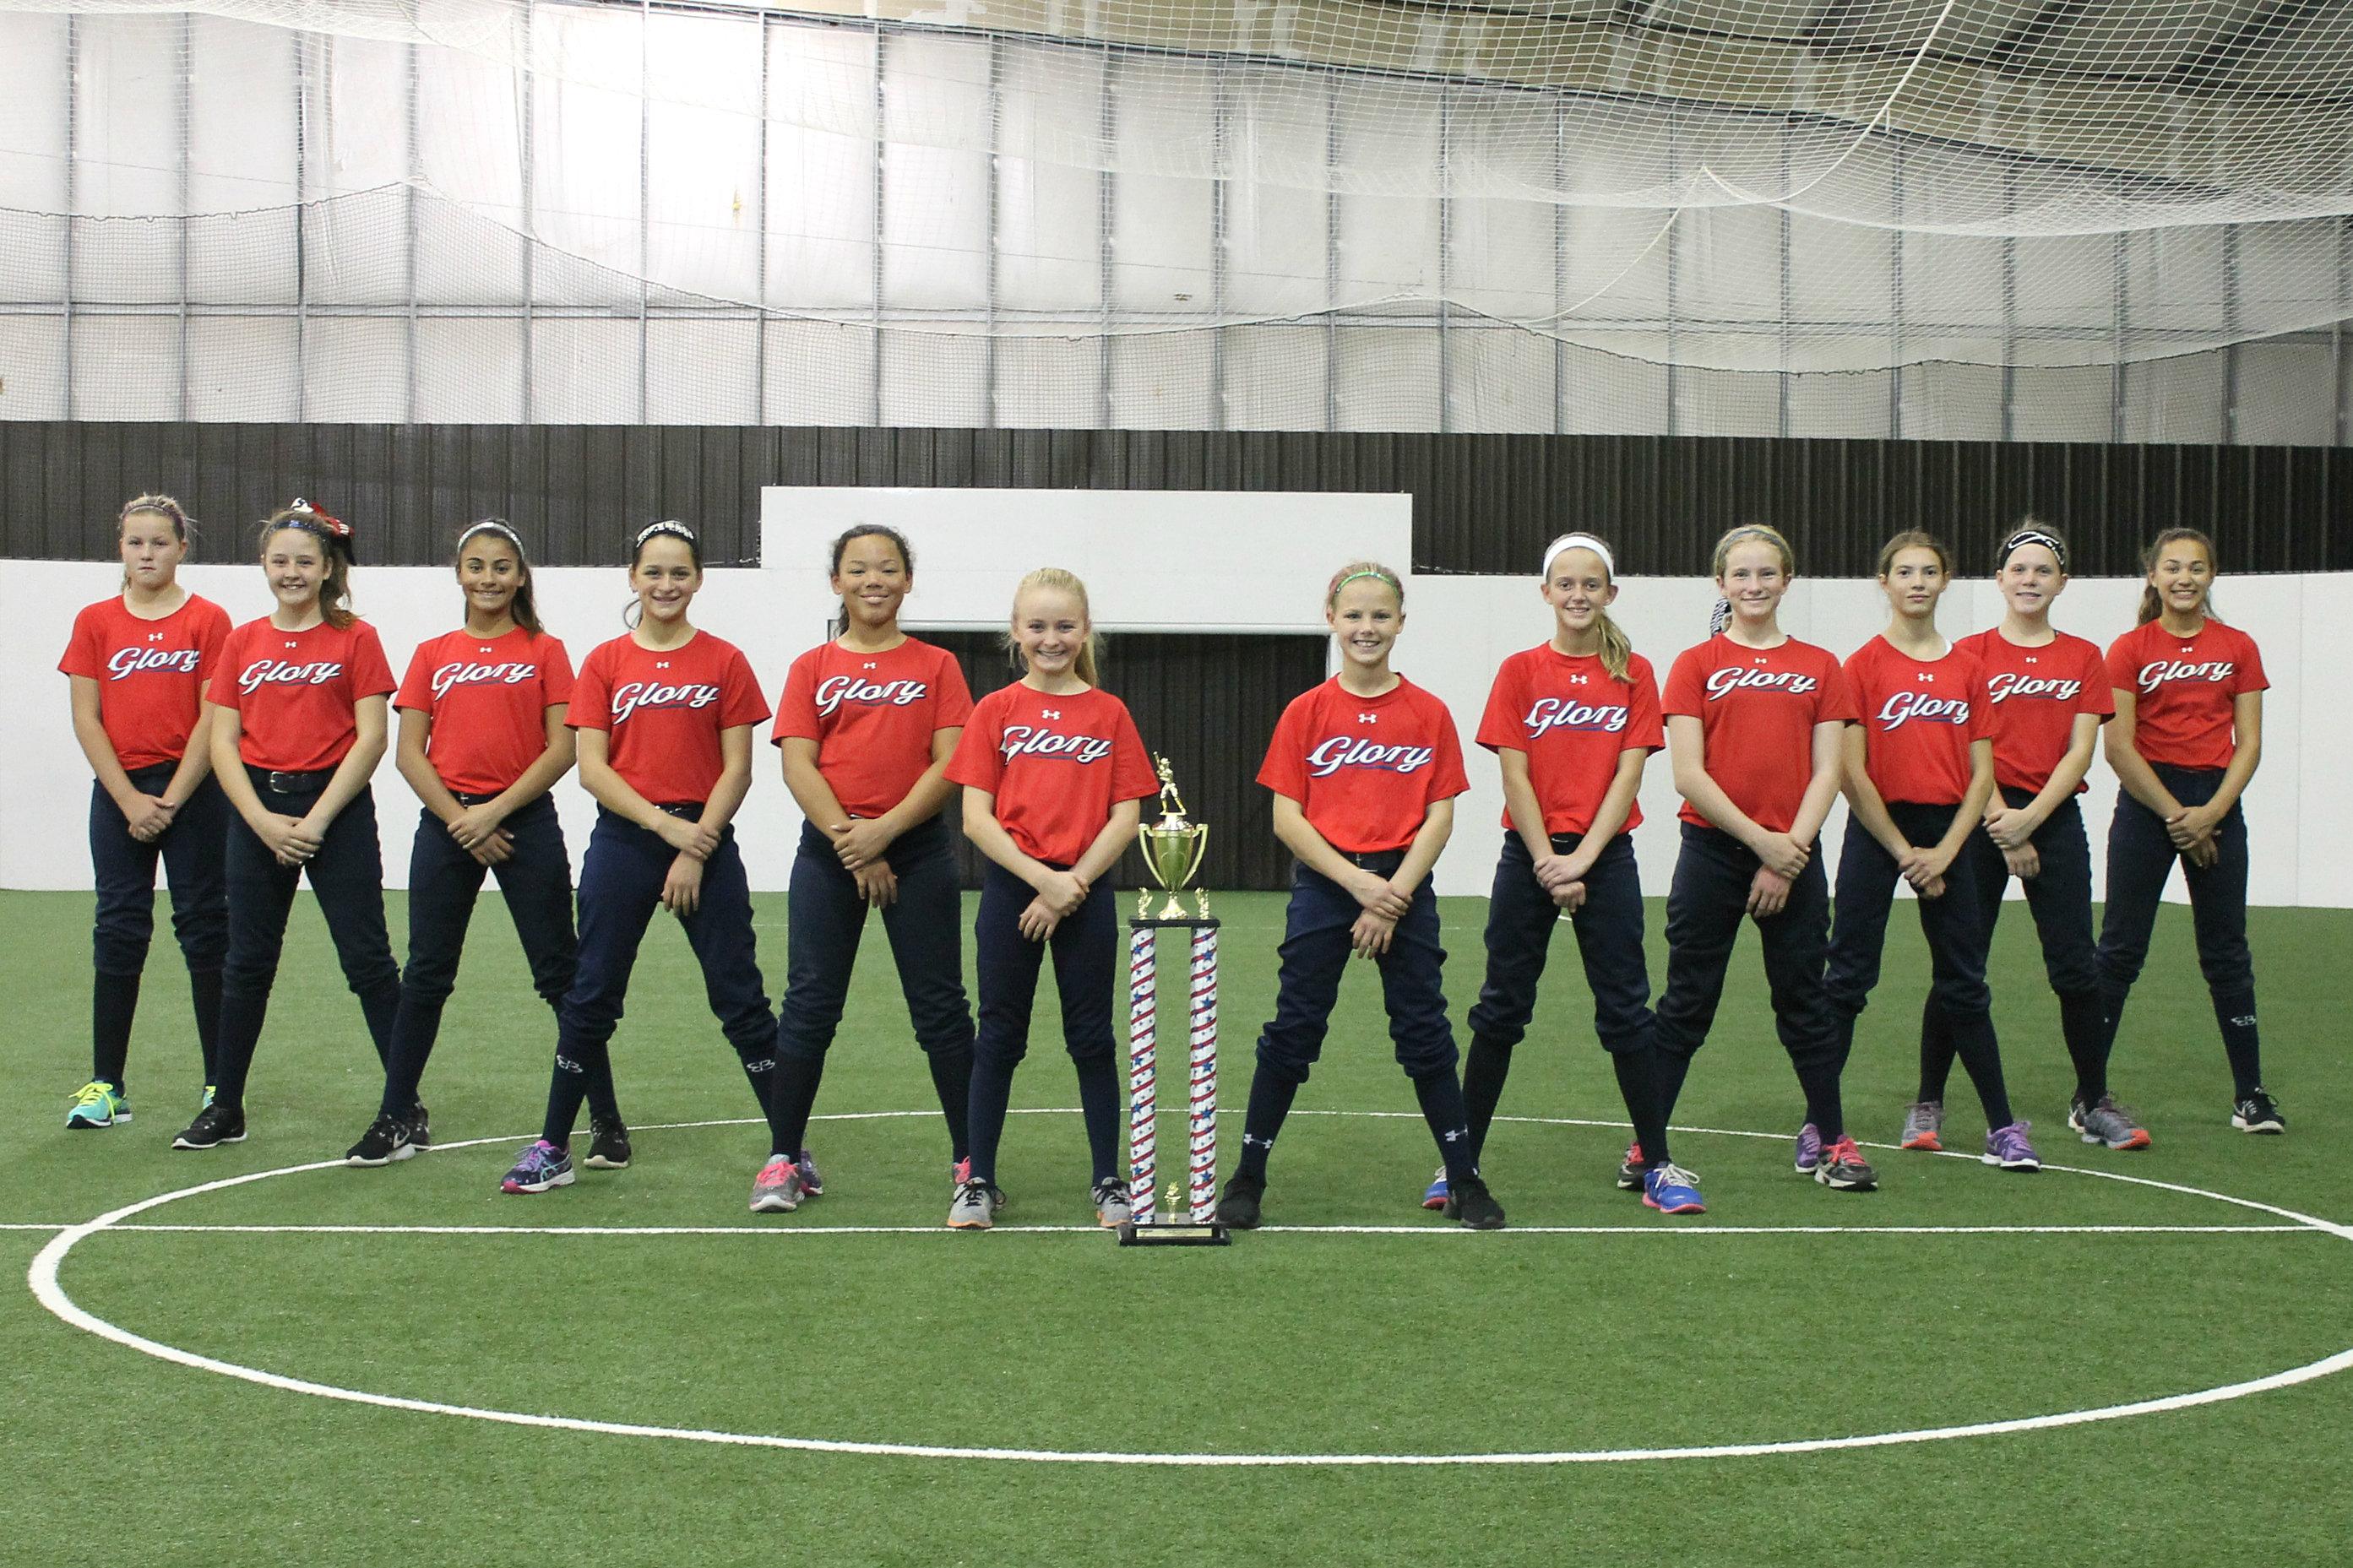 team glory fastpitch softball mil appreciation wix logo